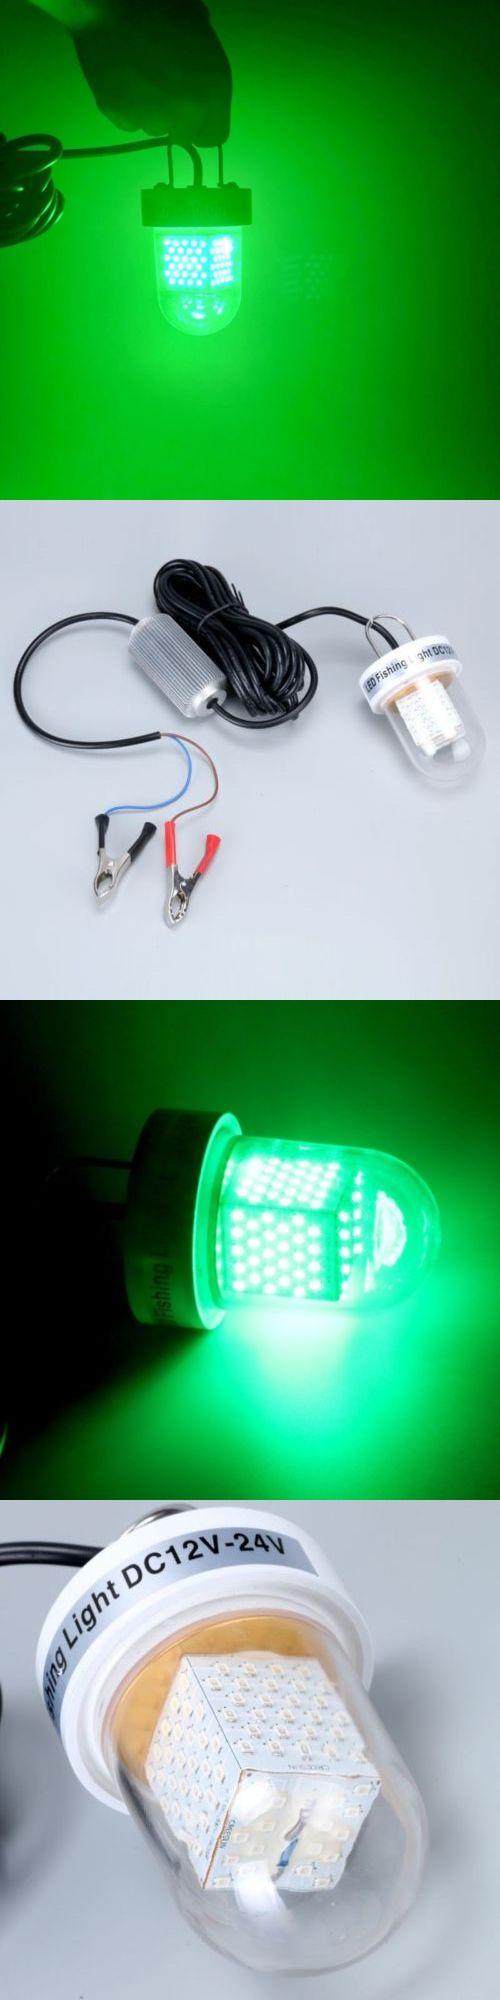 lights 123489: nice!!! 126led 12v 60w 3780 lumens green ip68 lure, Reel Combo